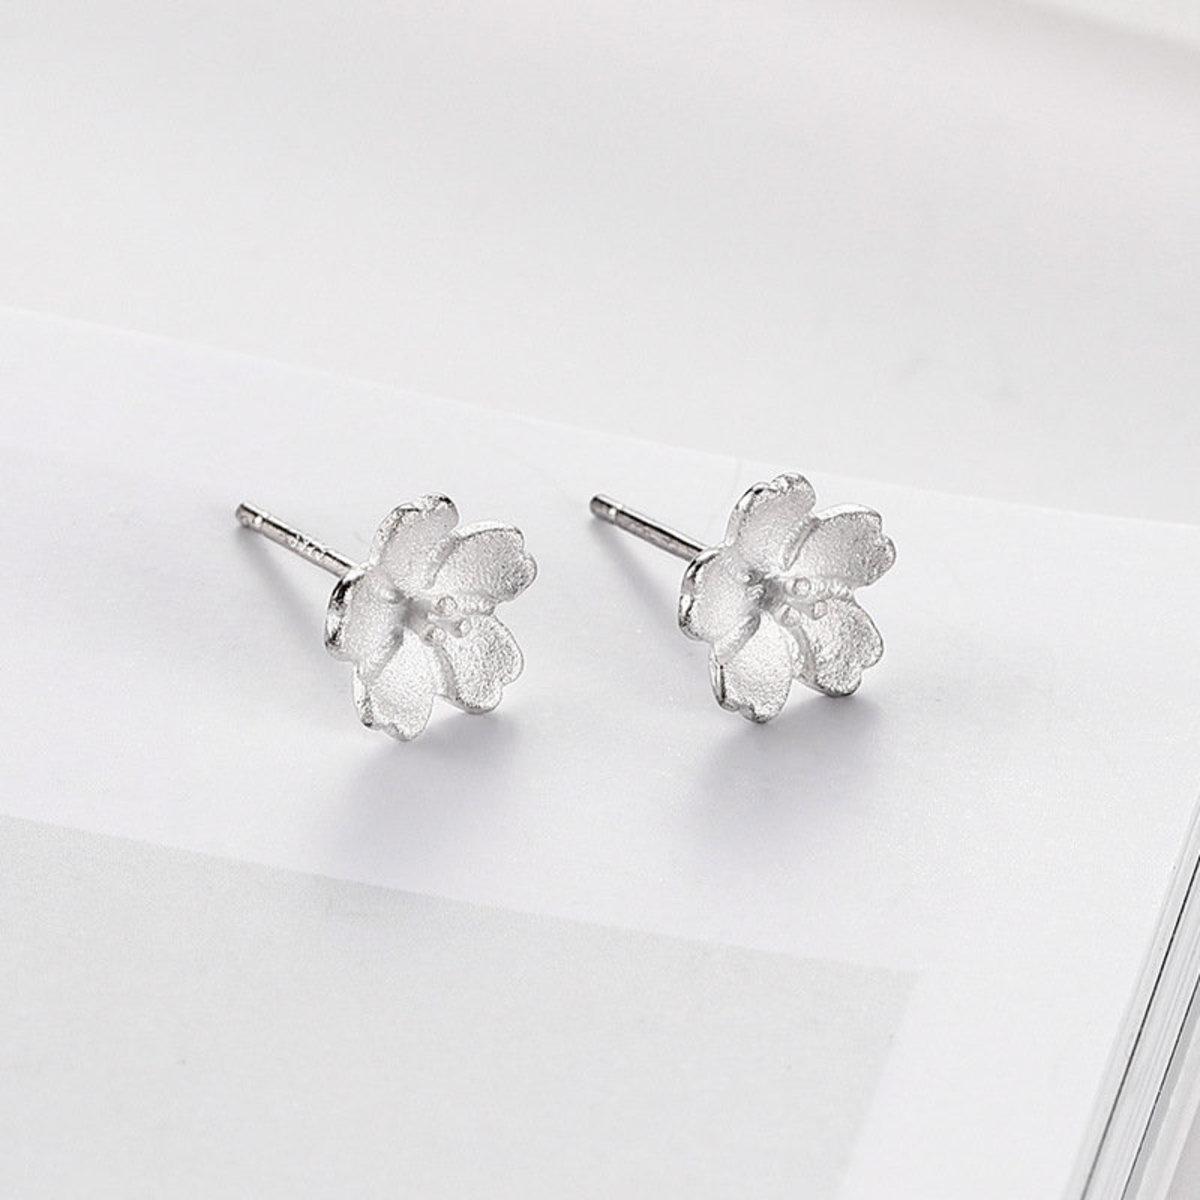 S925純銀日韓簡約防過敏耳釘耳環(小櫻花)